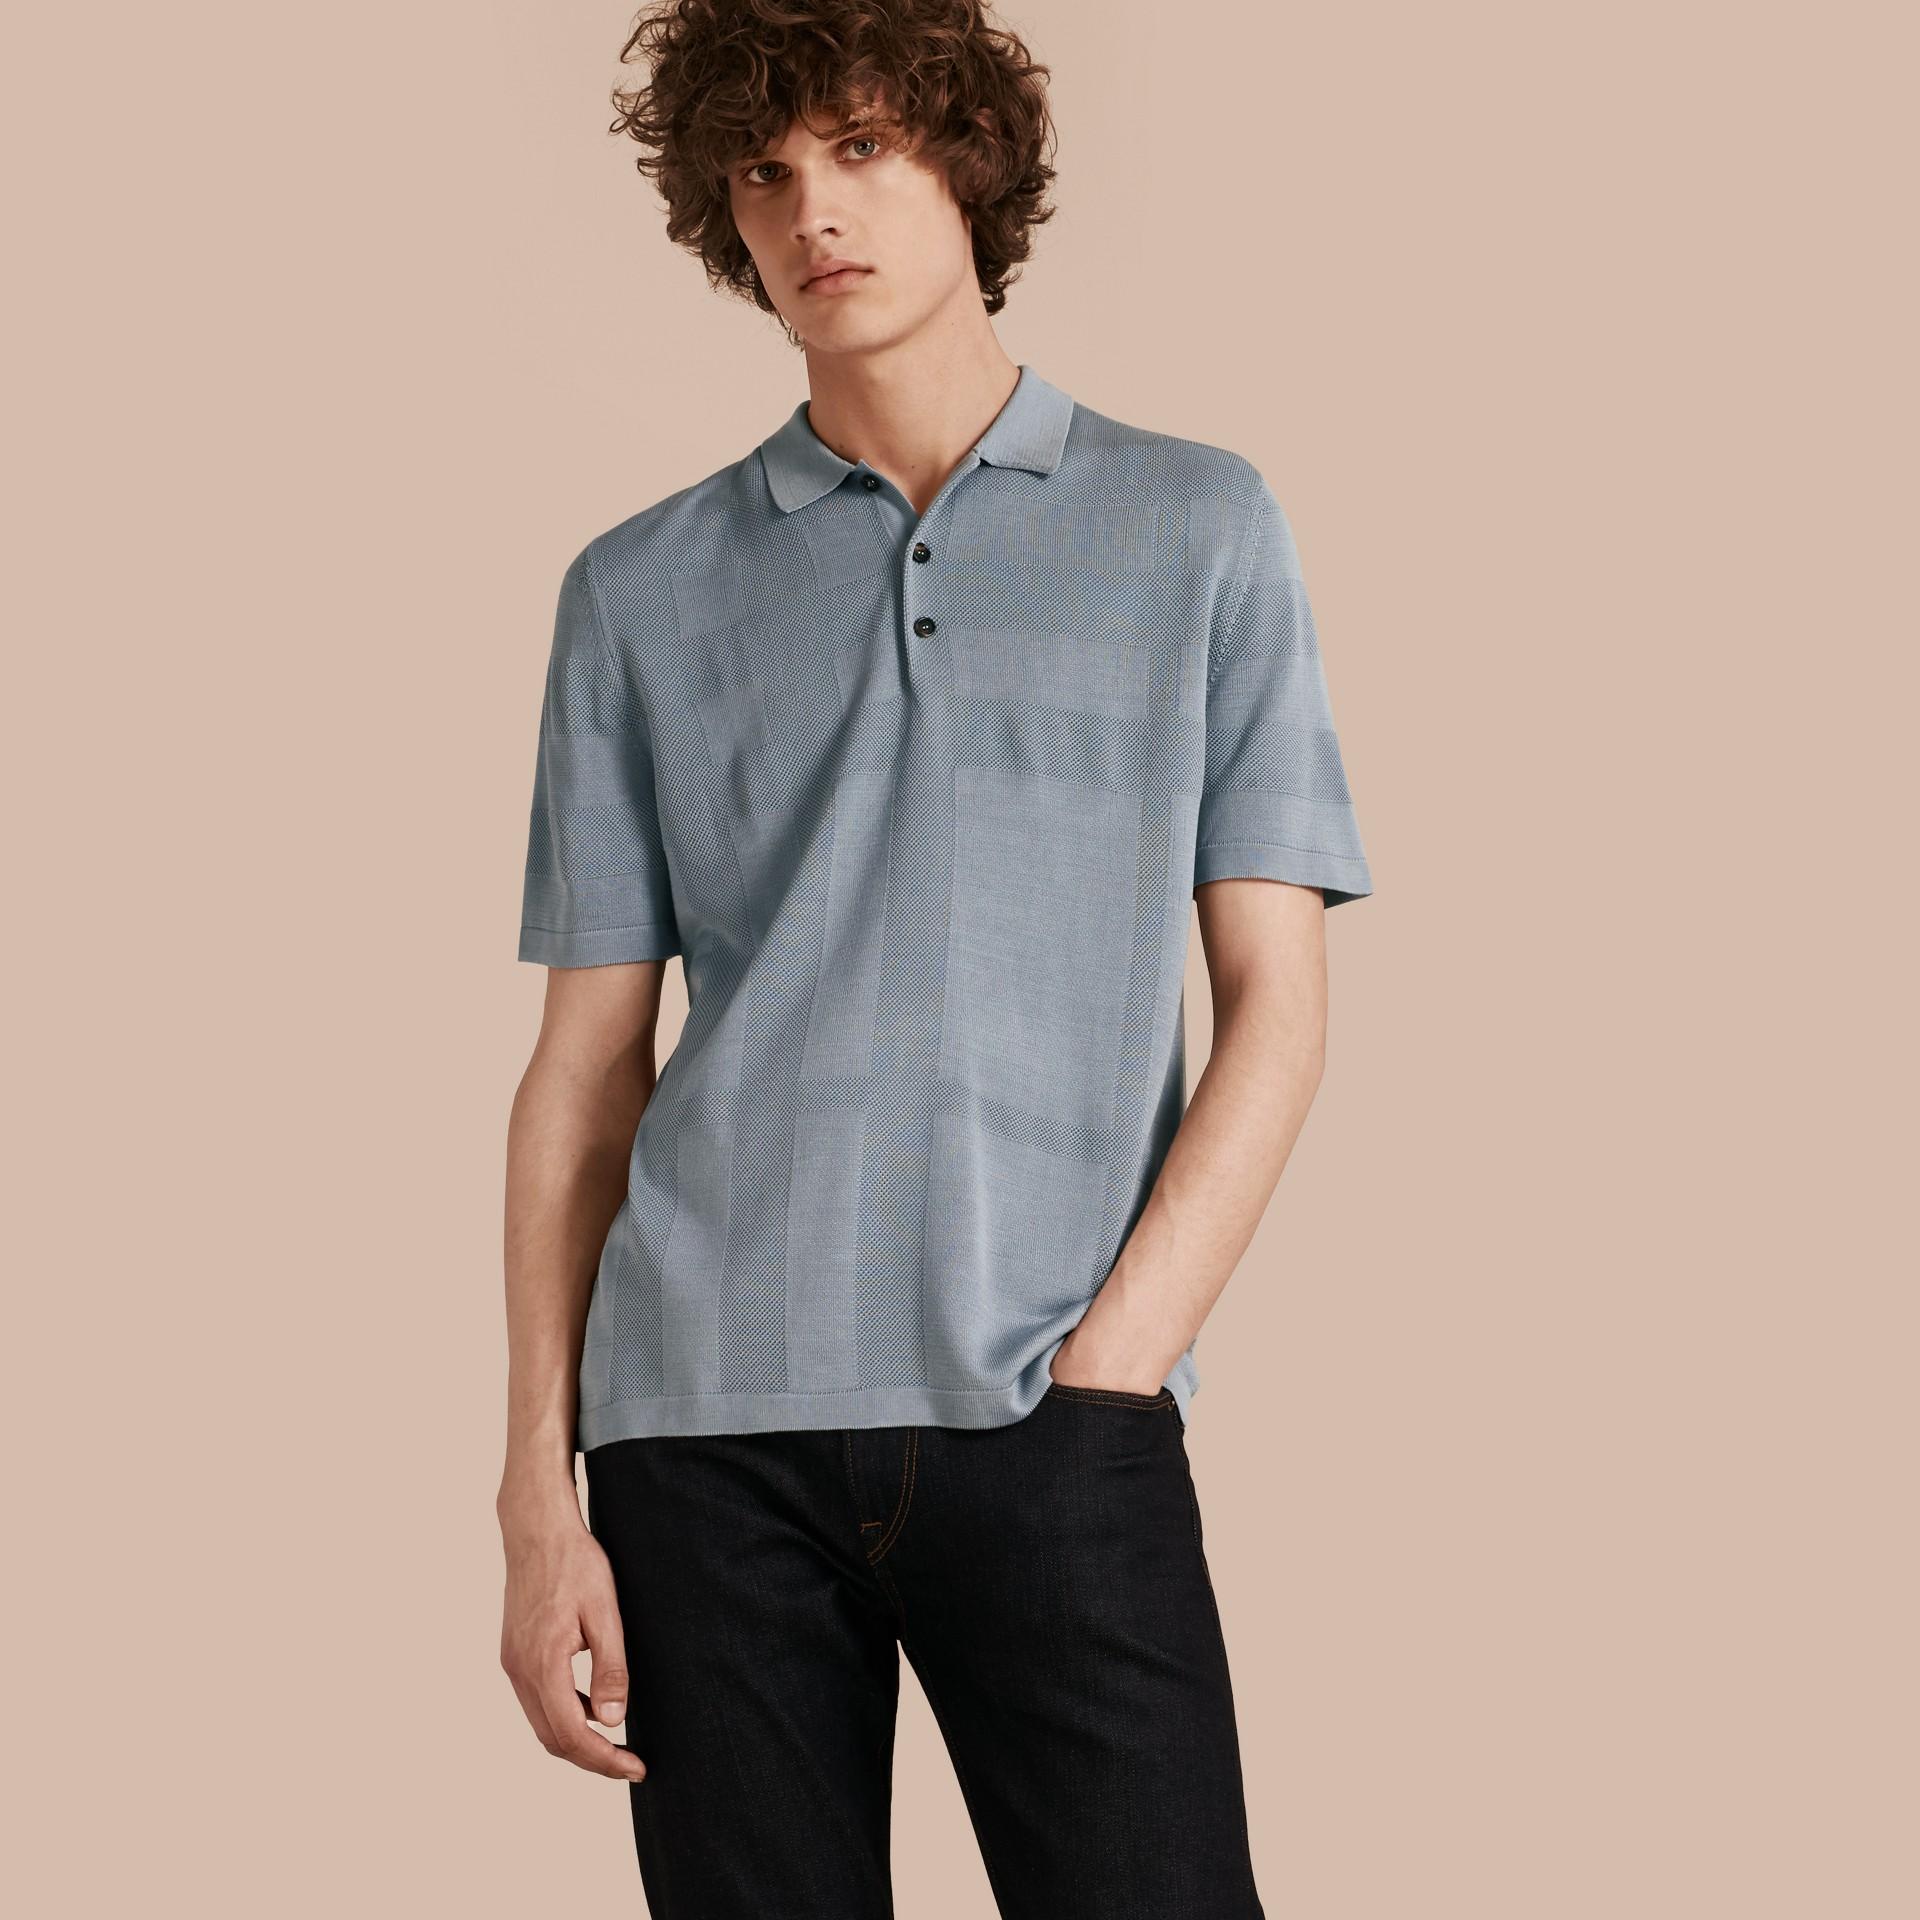 Check Jacquard Piqué Silk Cotton Polo Shirt in Slate Blue - Men | Burberry Singapore - gallery image 1